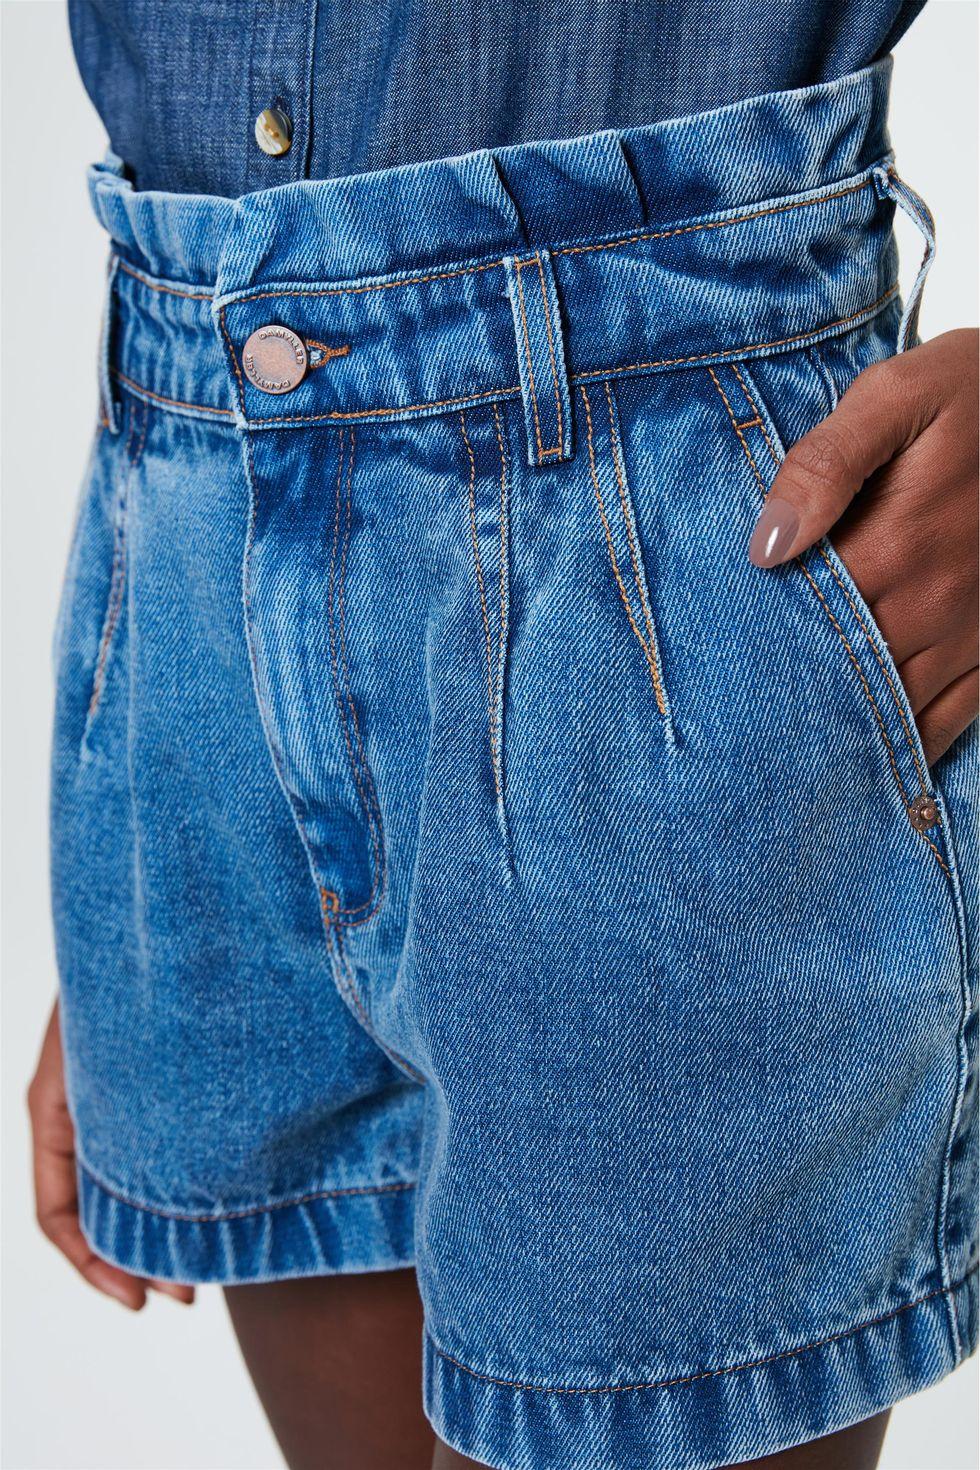 Short-Jeans-Mini-Clochard-Frente--